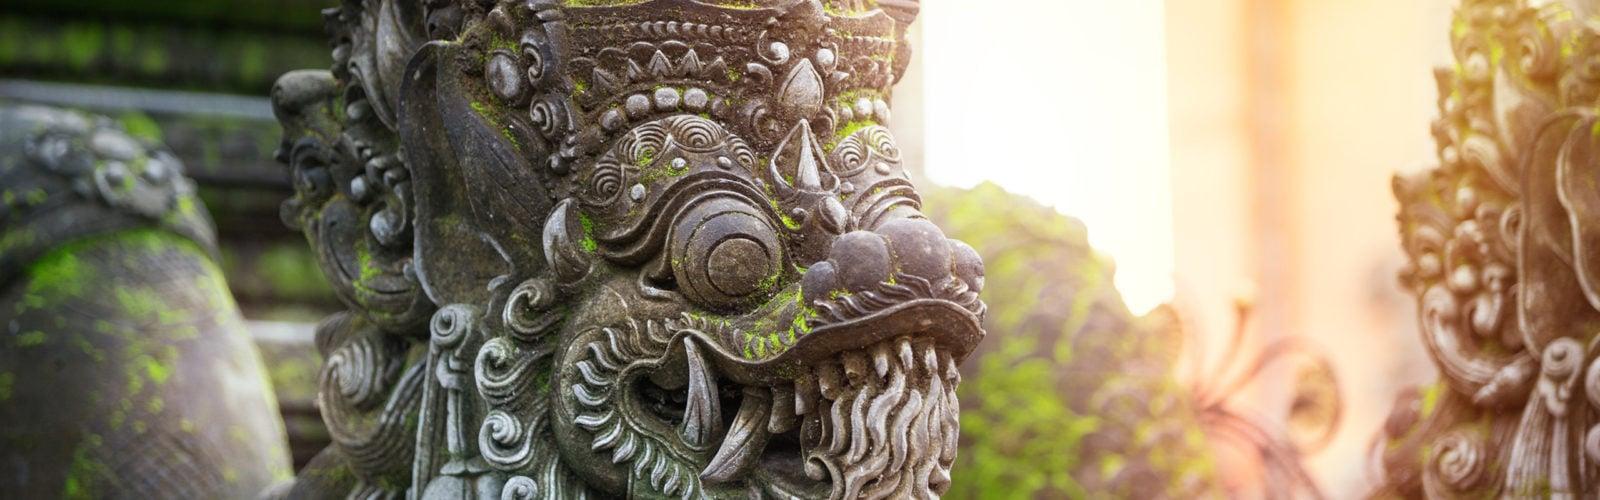 indonesia-stone-statue